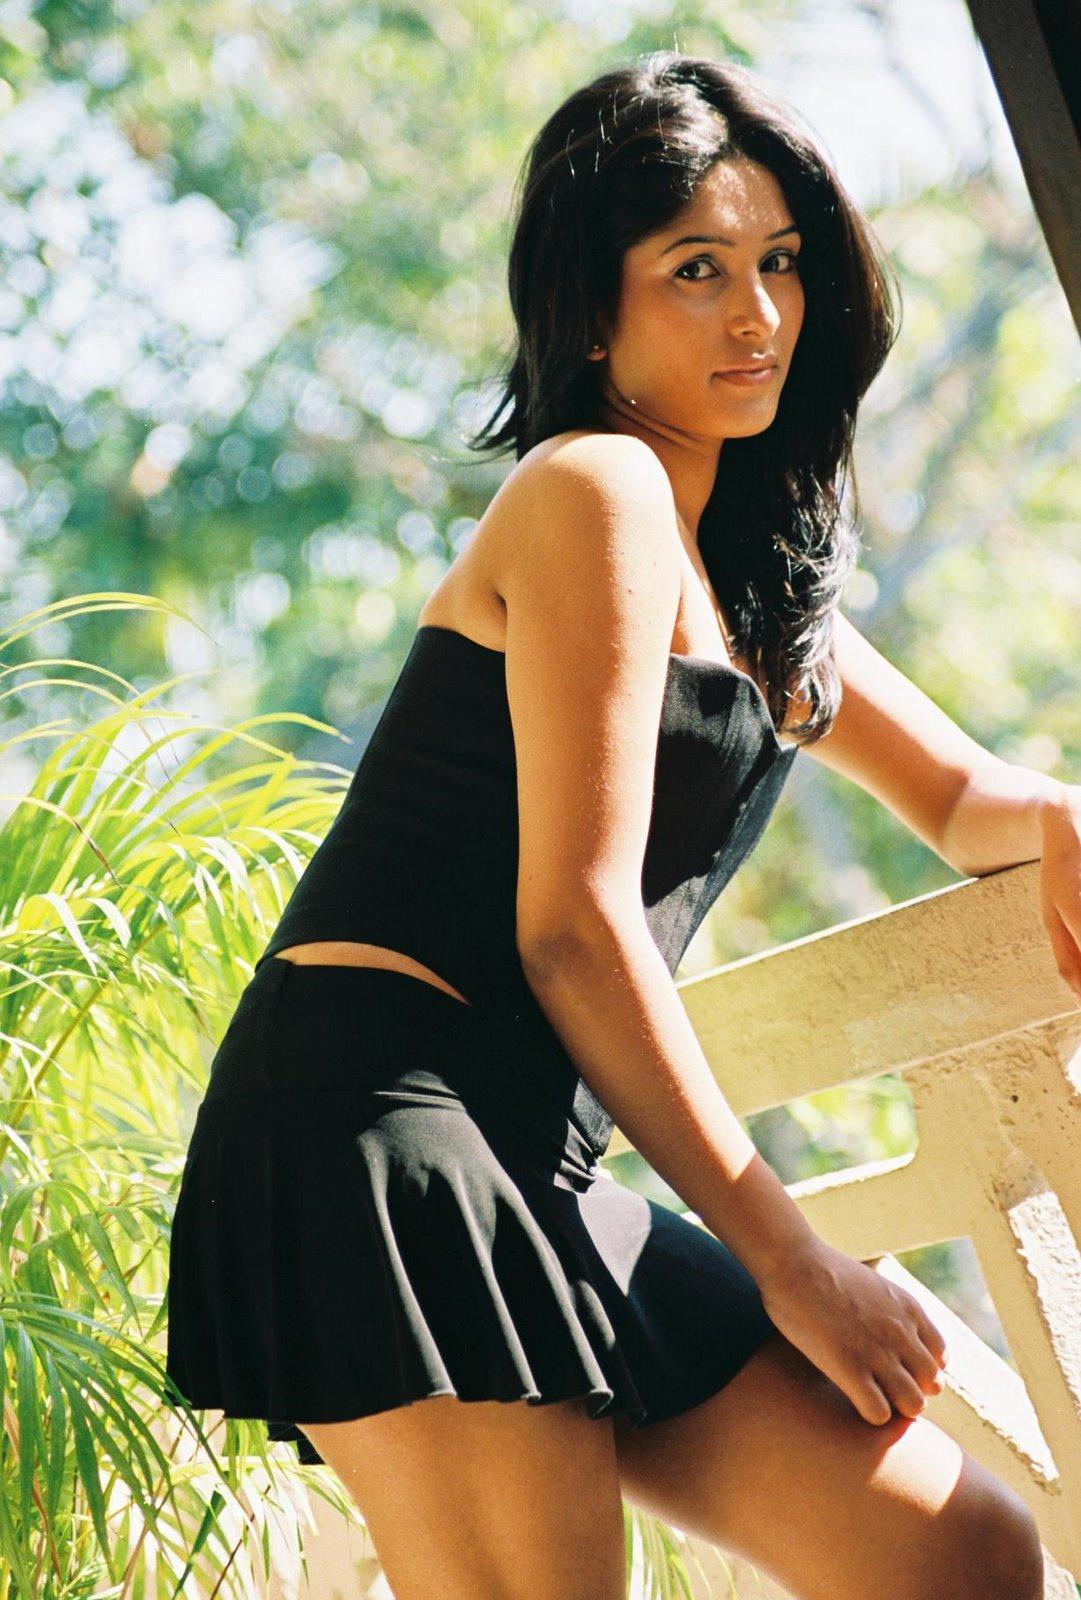 TamilCineStuff | : Upeksha Swarnamali hot and seductive